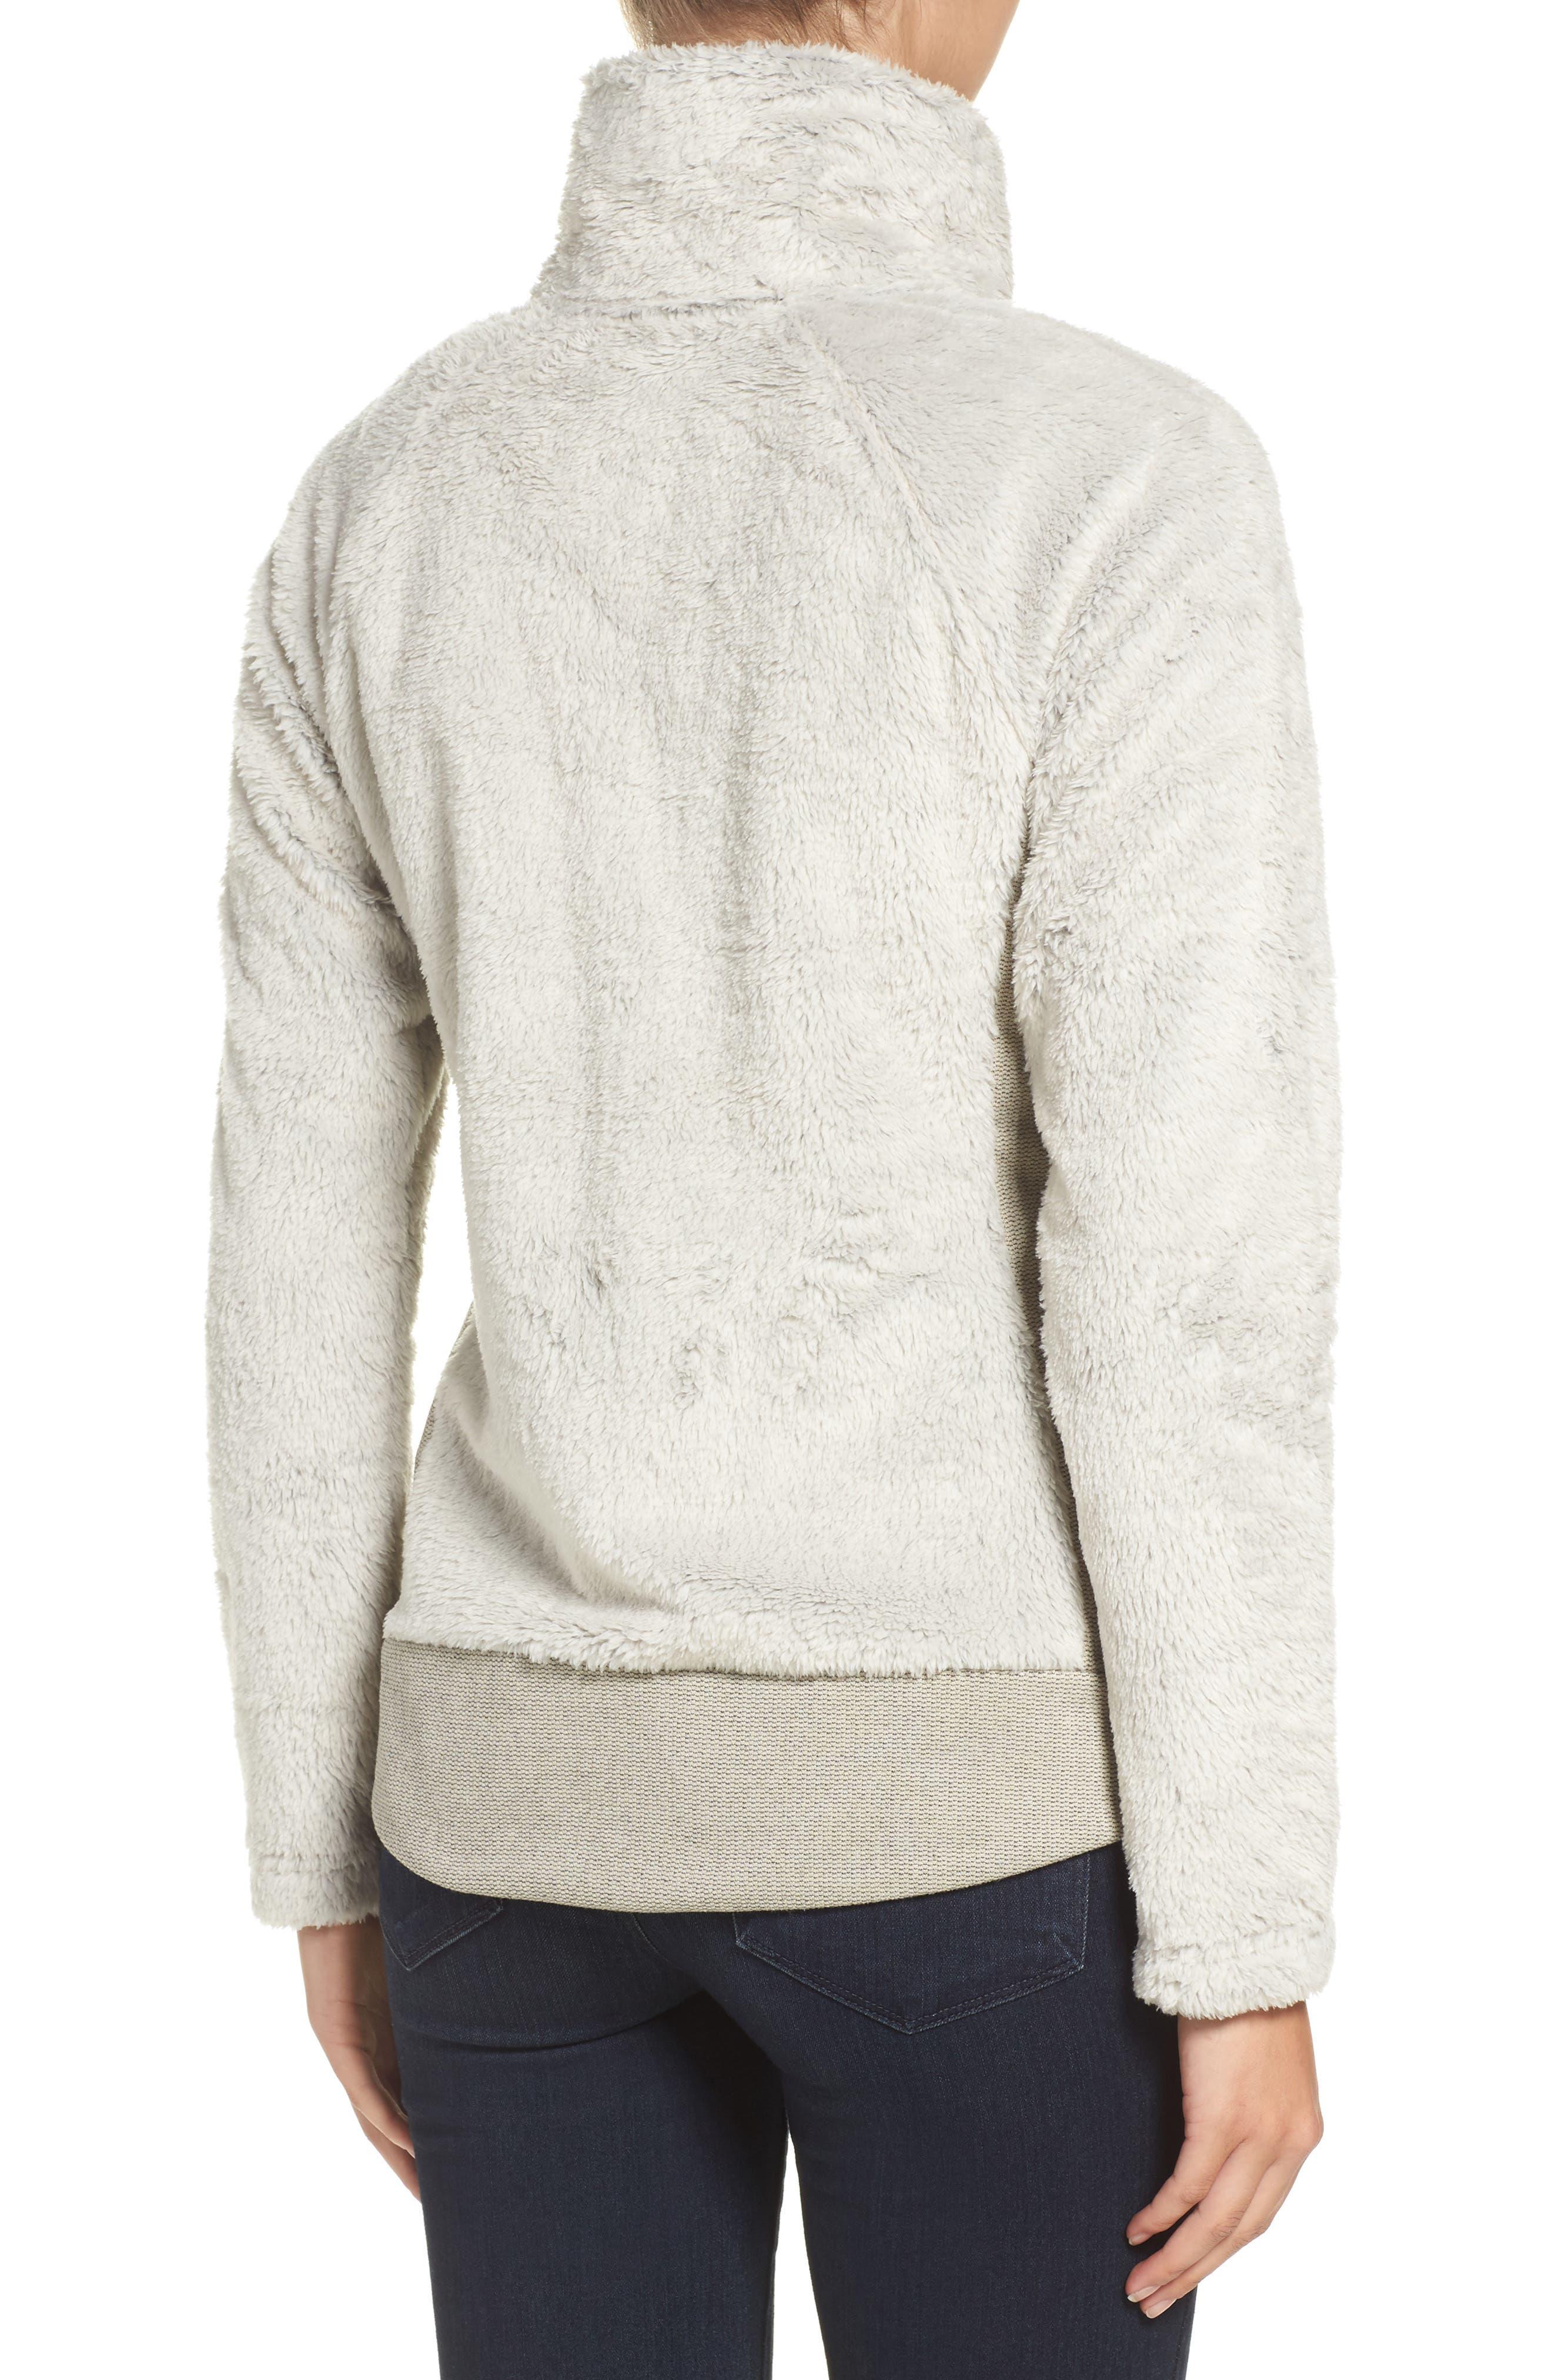 Furry Fleece Jacket,                             Alternate thumbnail 15, color,